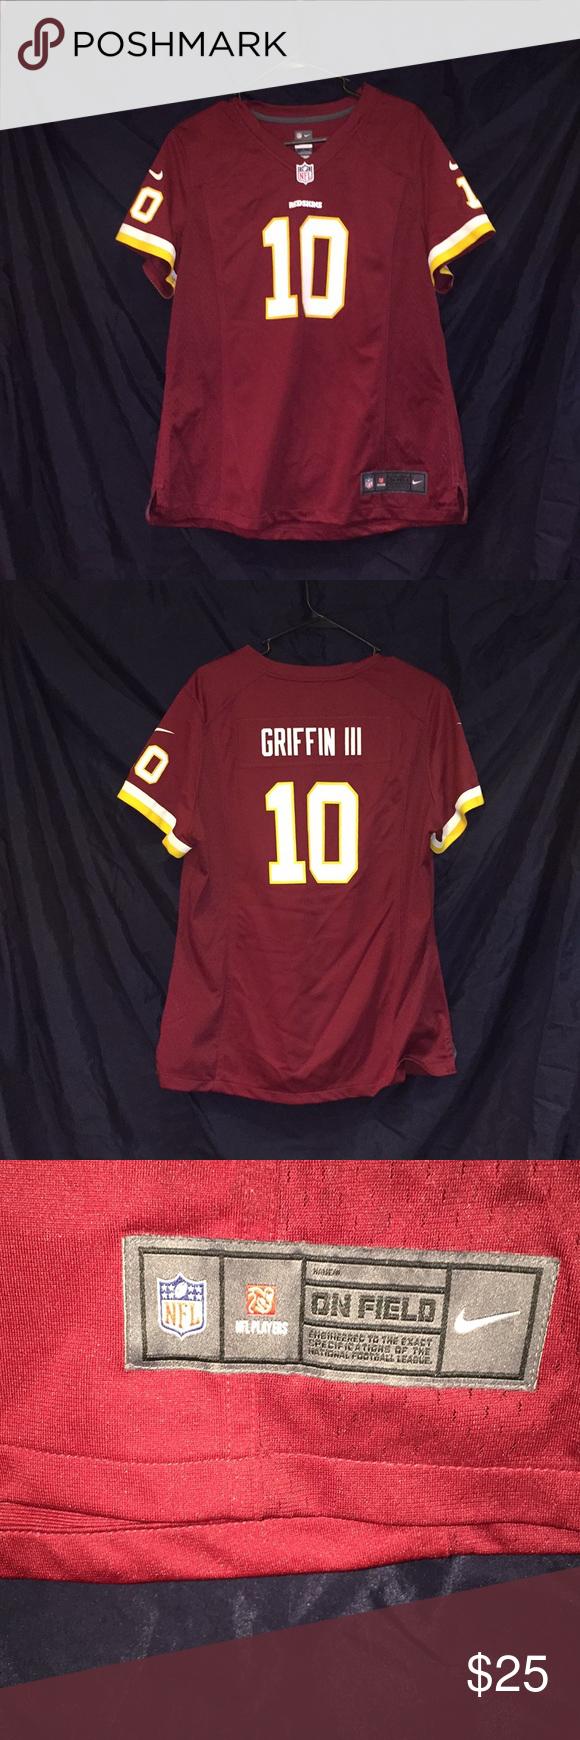 save off da2d4 7722b Nike Washington Redskins Rg3 Jersey 🔥🔥🔥 $14 Brand:Nike ...